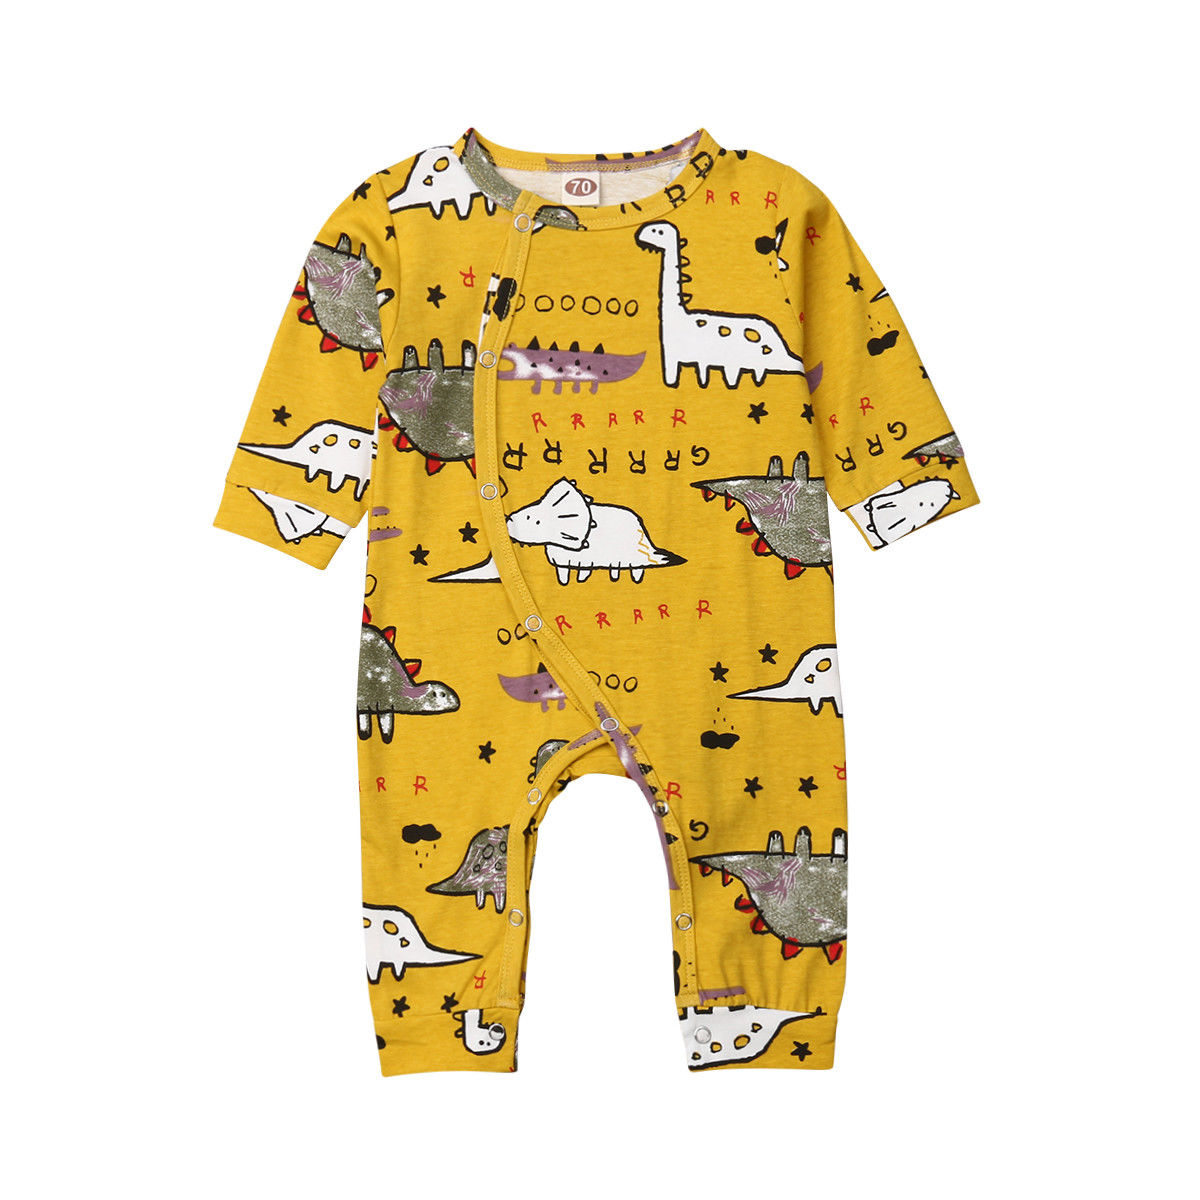 0-18 M Infant Neugeborenen Baby Junge Mädchen Langarm Cartoon Dinosaurier Baumwolle Romper Overall Overall Outfits Baby Kleidung